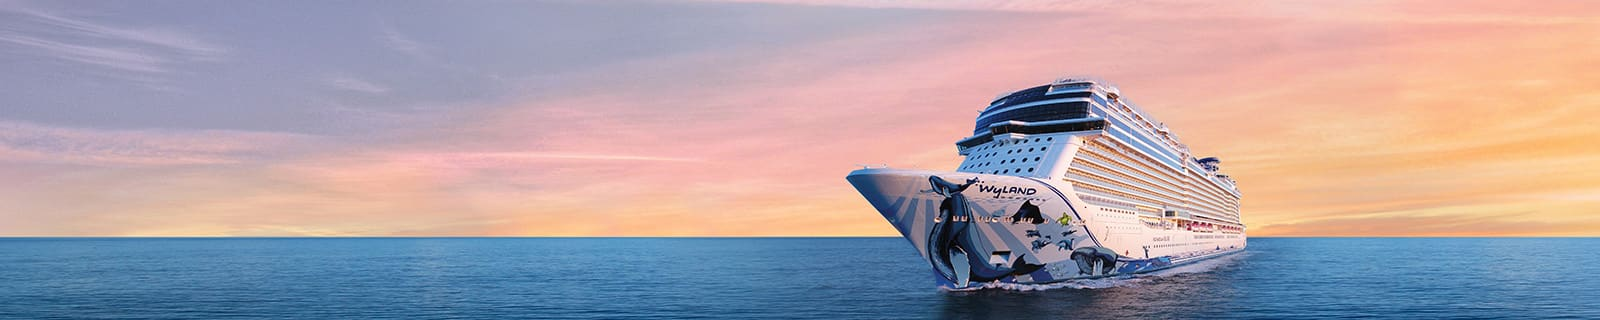 MI.Cruise_Freedomページ1600x320